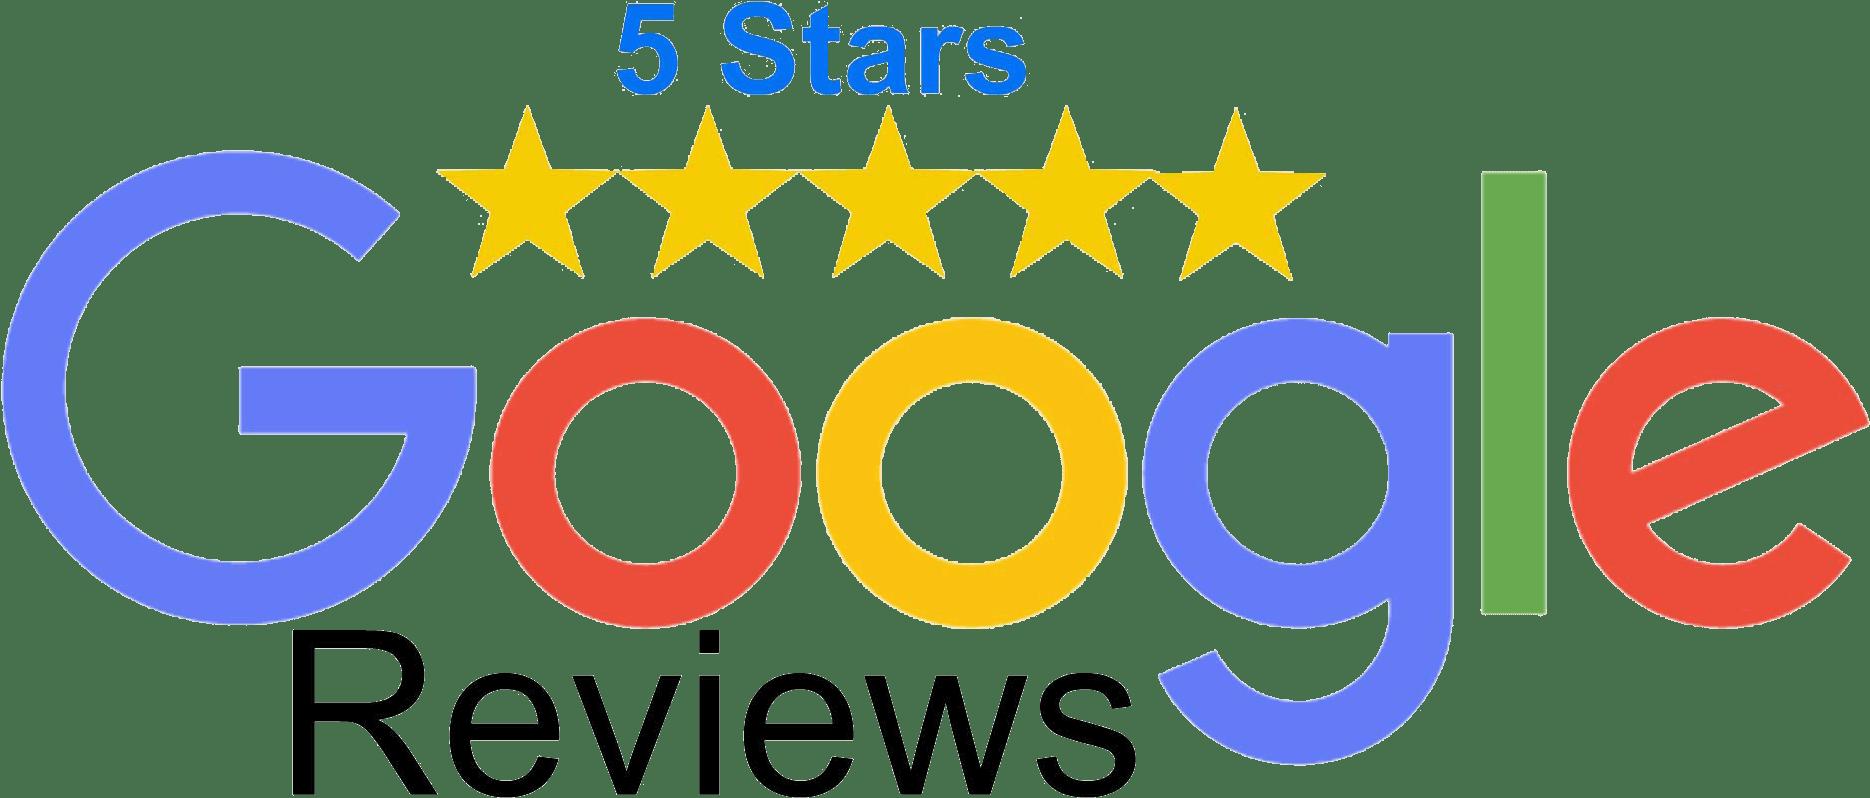 toppng.com-5-star-google-reviews-google-review-5-stars-1870x798-1